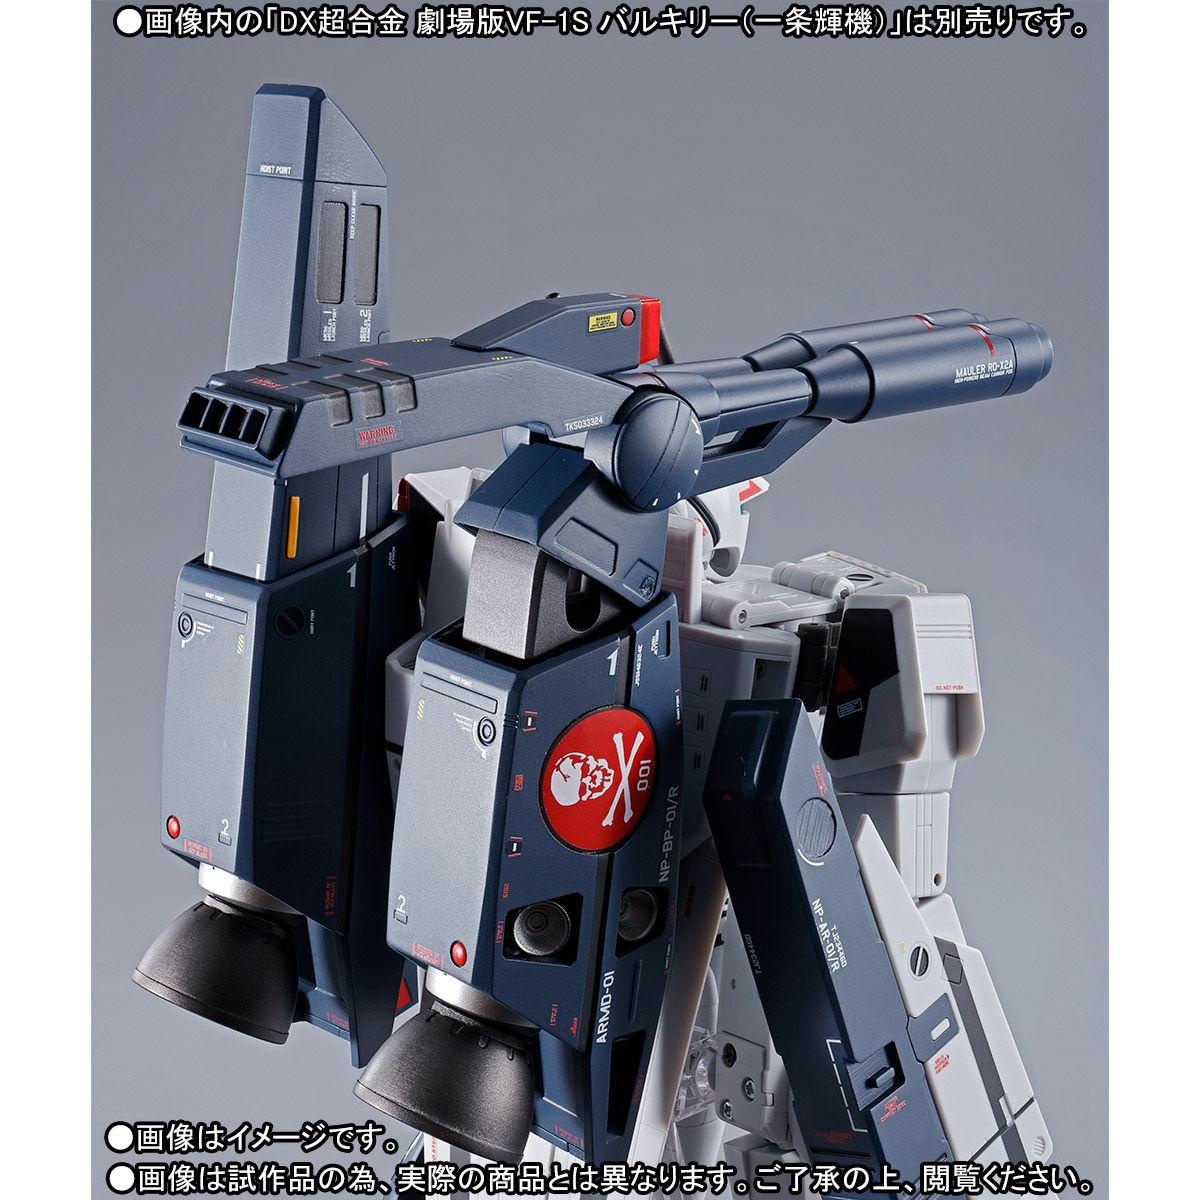 DX超合金『劇場版VF-1対応ストライク/スーパーパーツセット』拡張パーツ-006